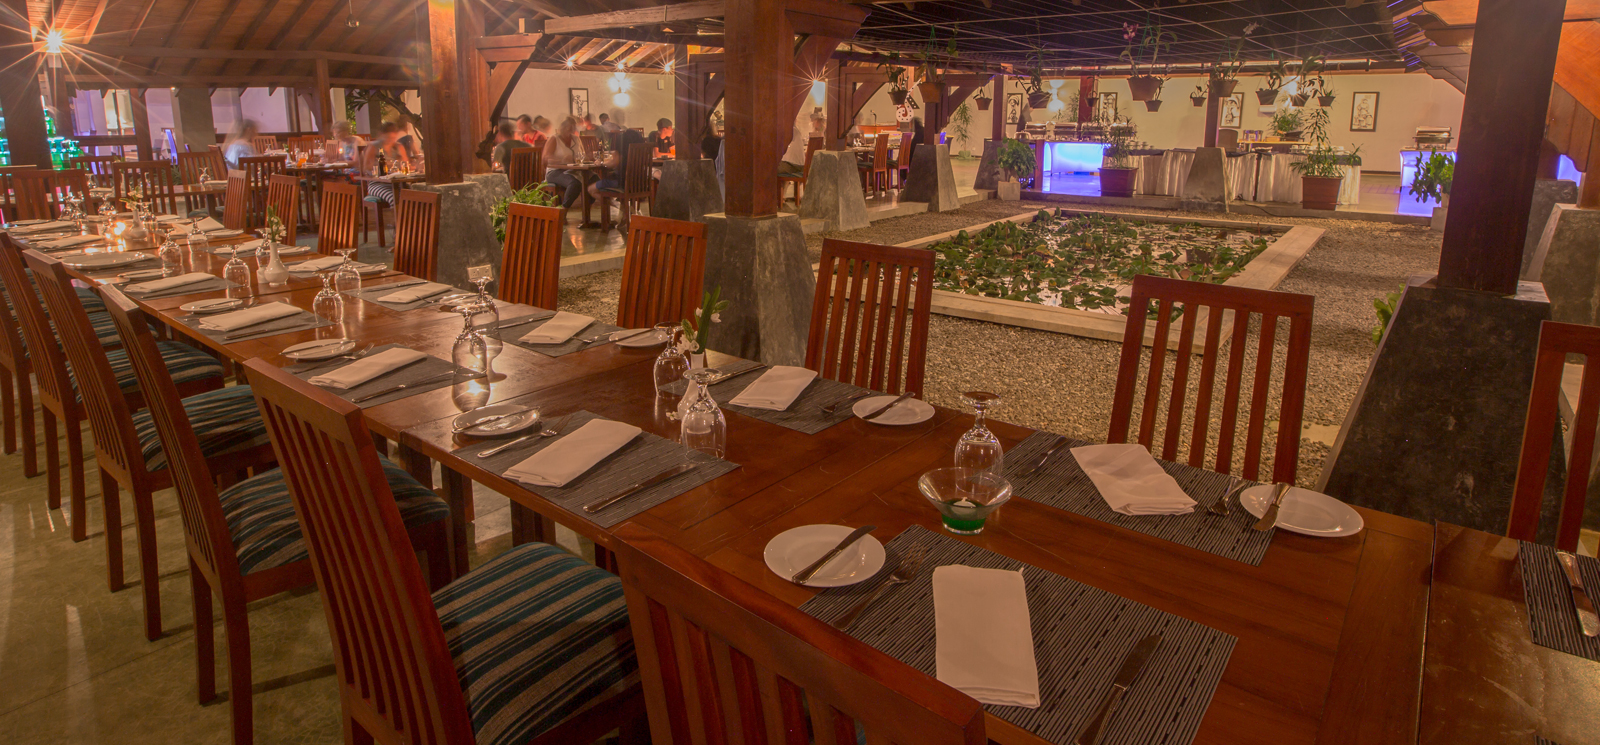 The Golden Palms Main Restaurant at The Palms Hotel, Beruwala, Sri Lanka